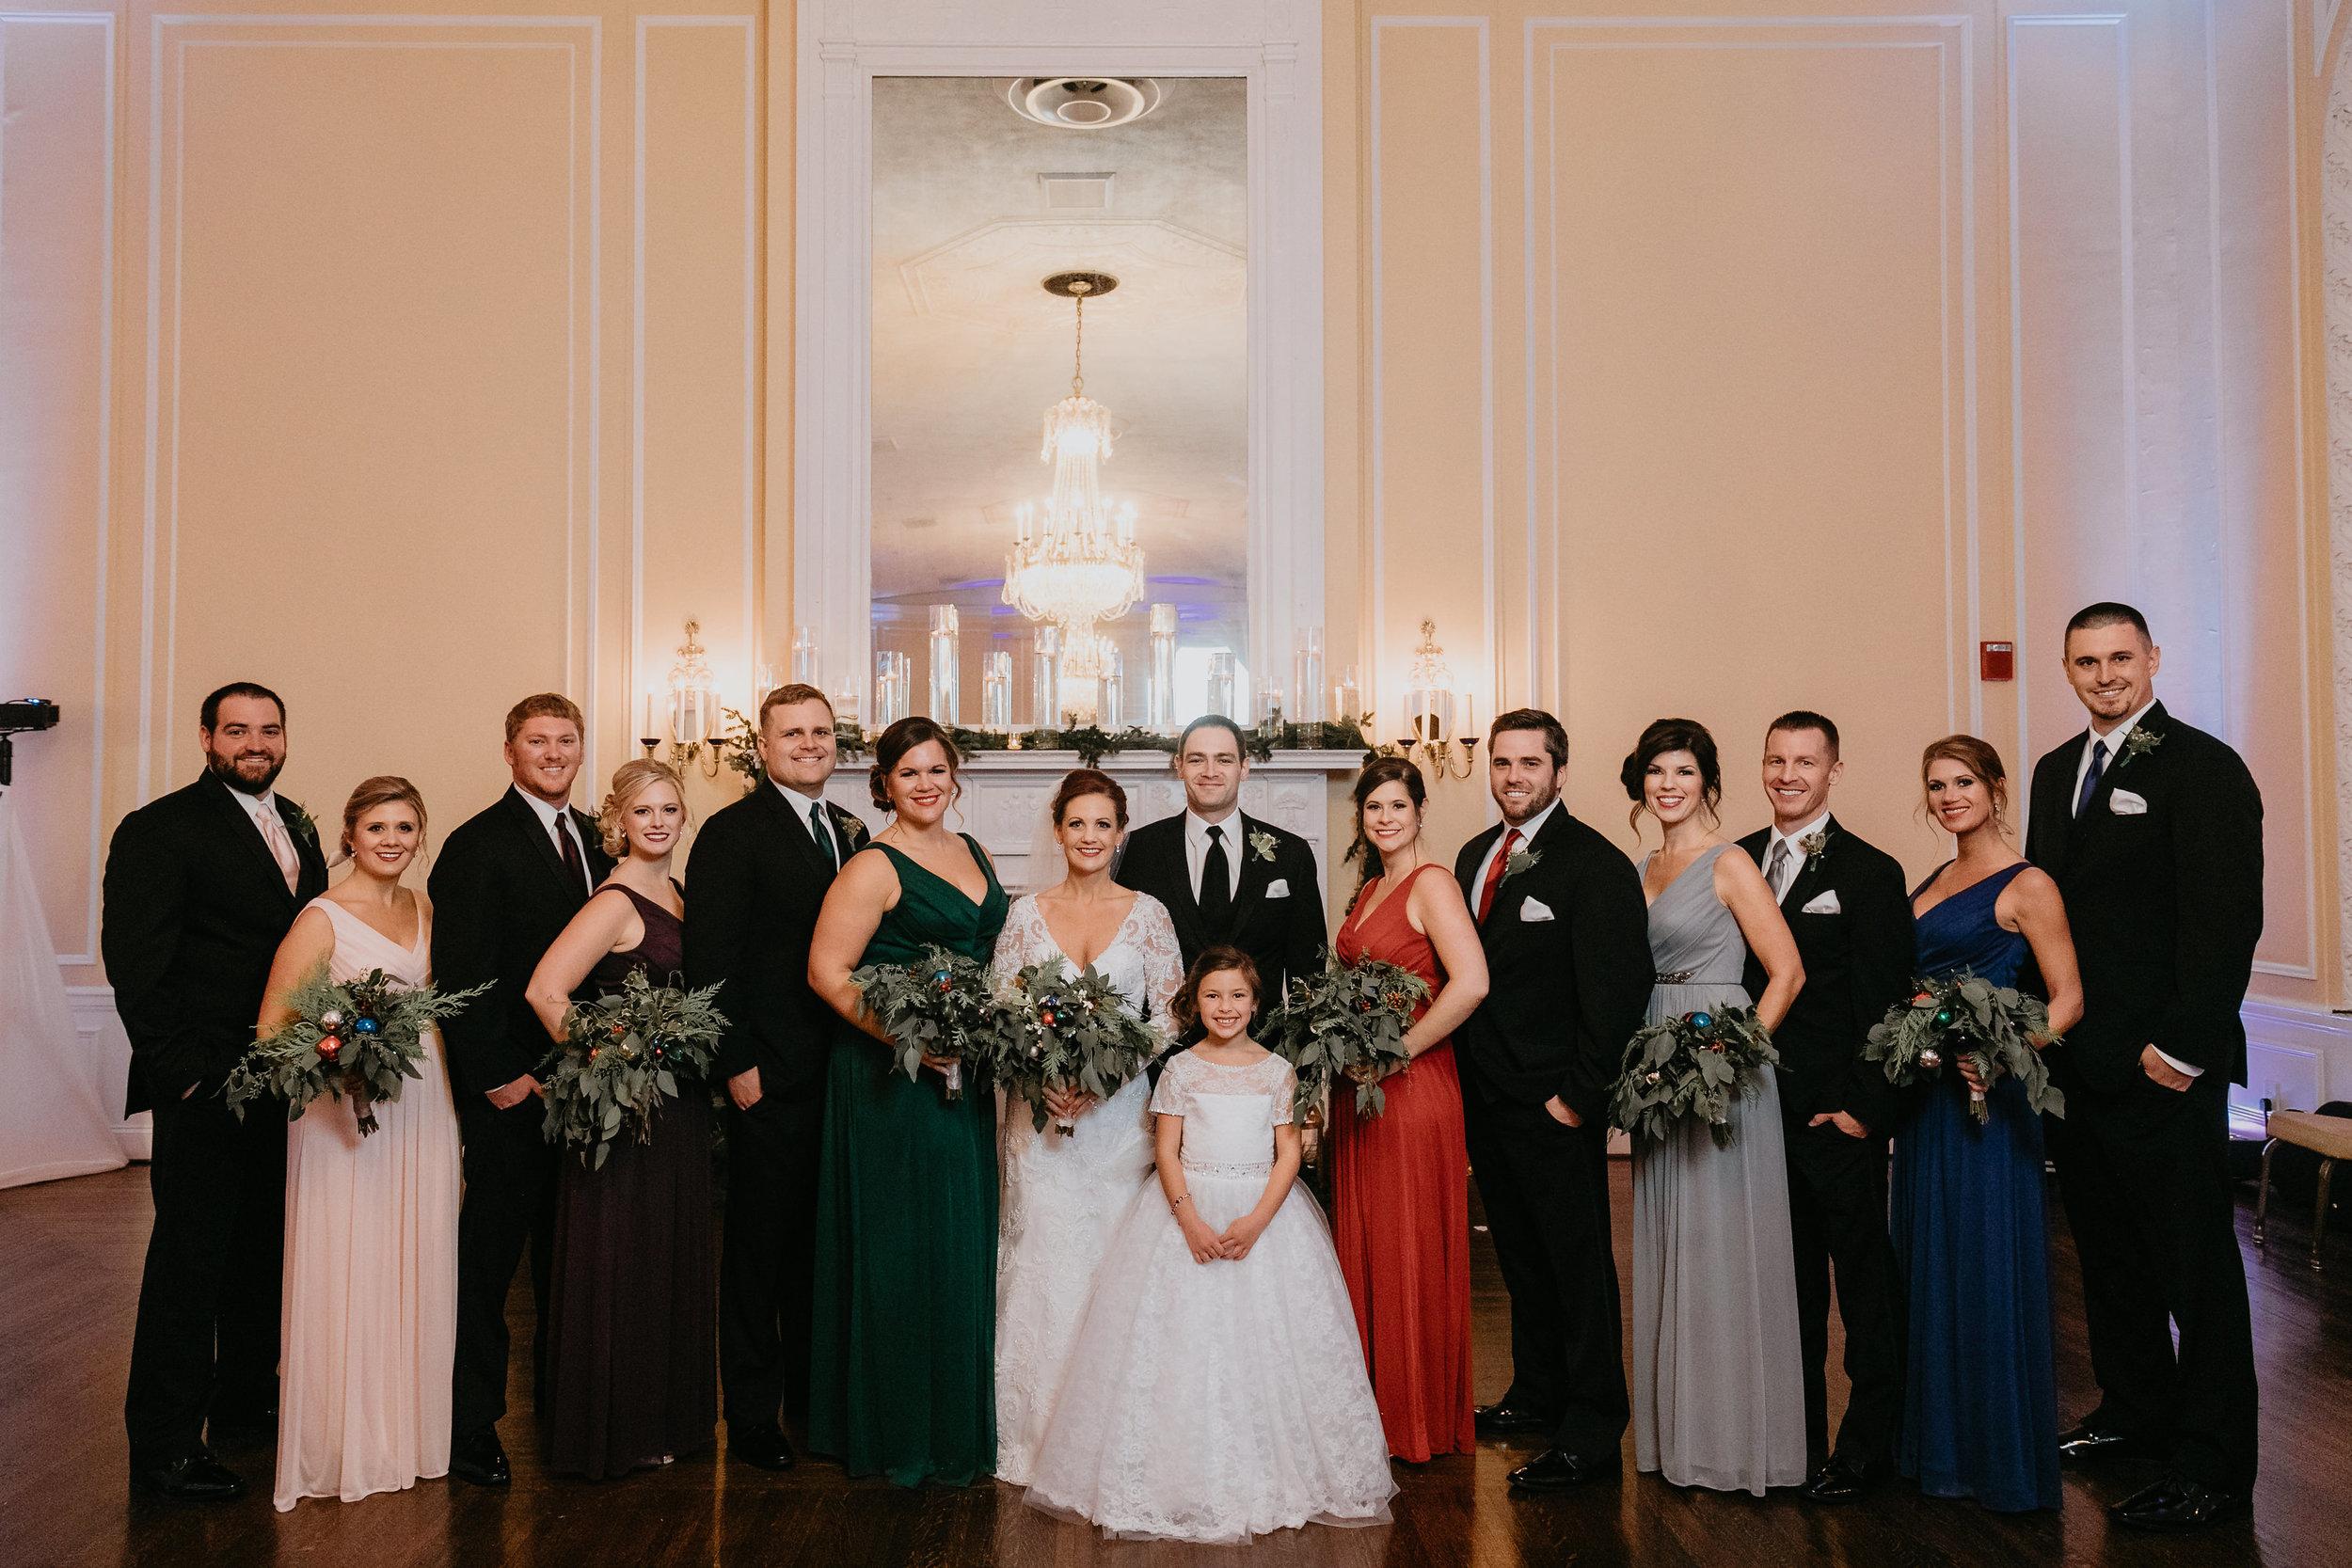 PatrickHenry-Weddings-Bestweddingphotographers-Virginia-PatCoriPhotography-435.jpg